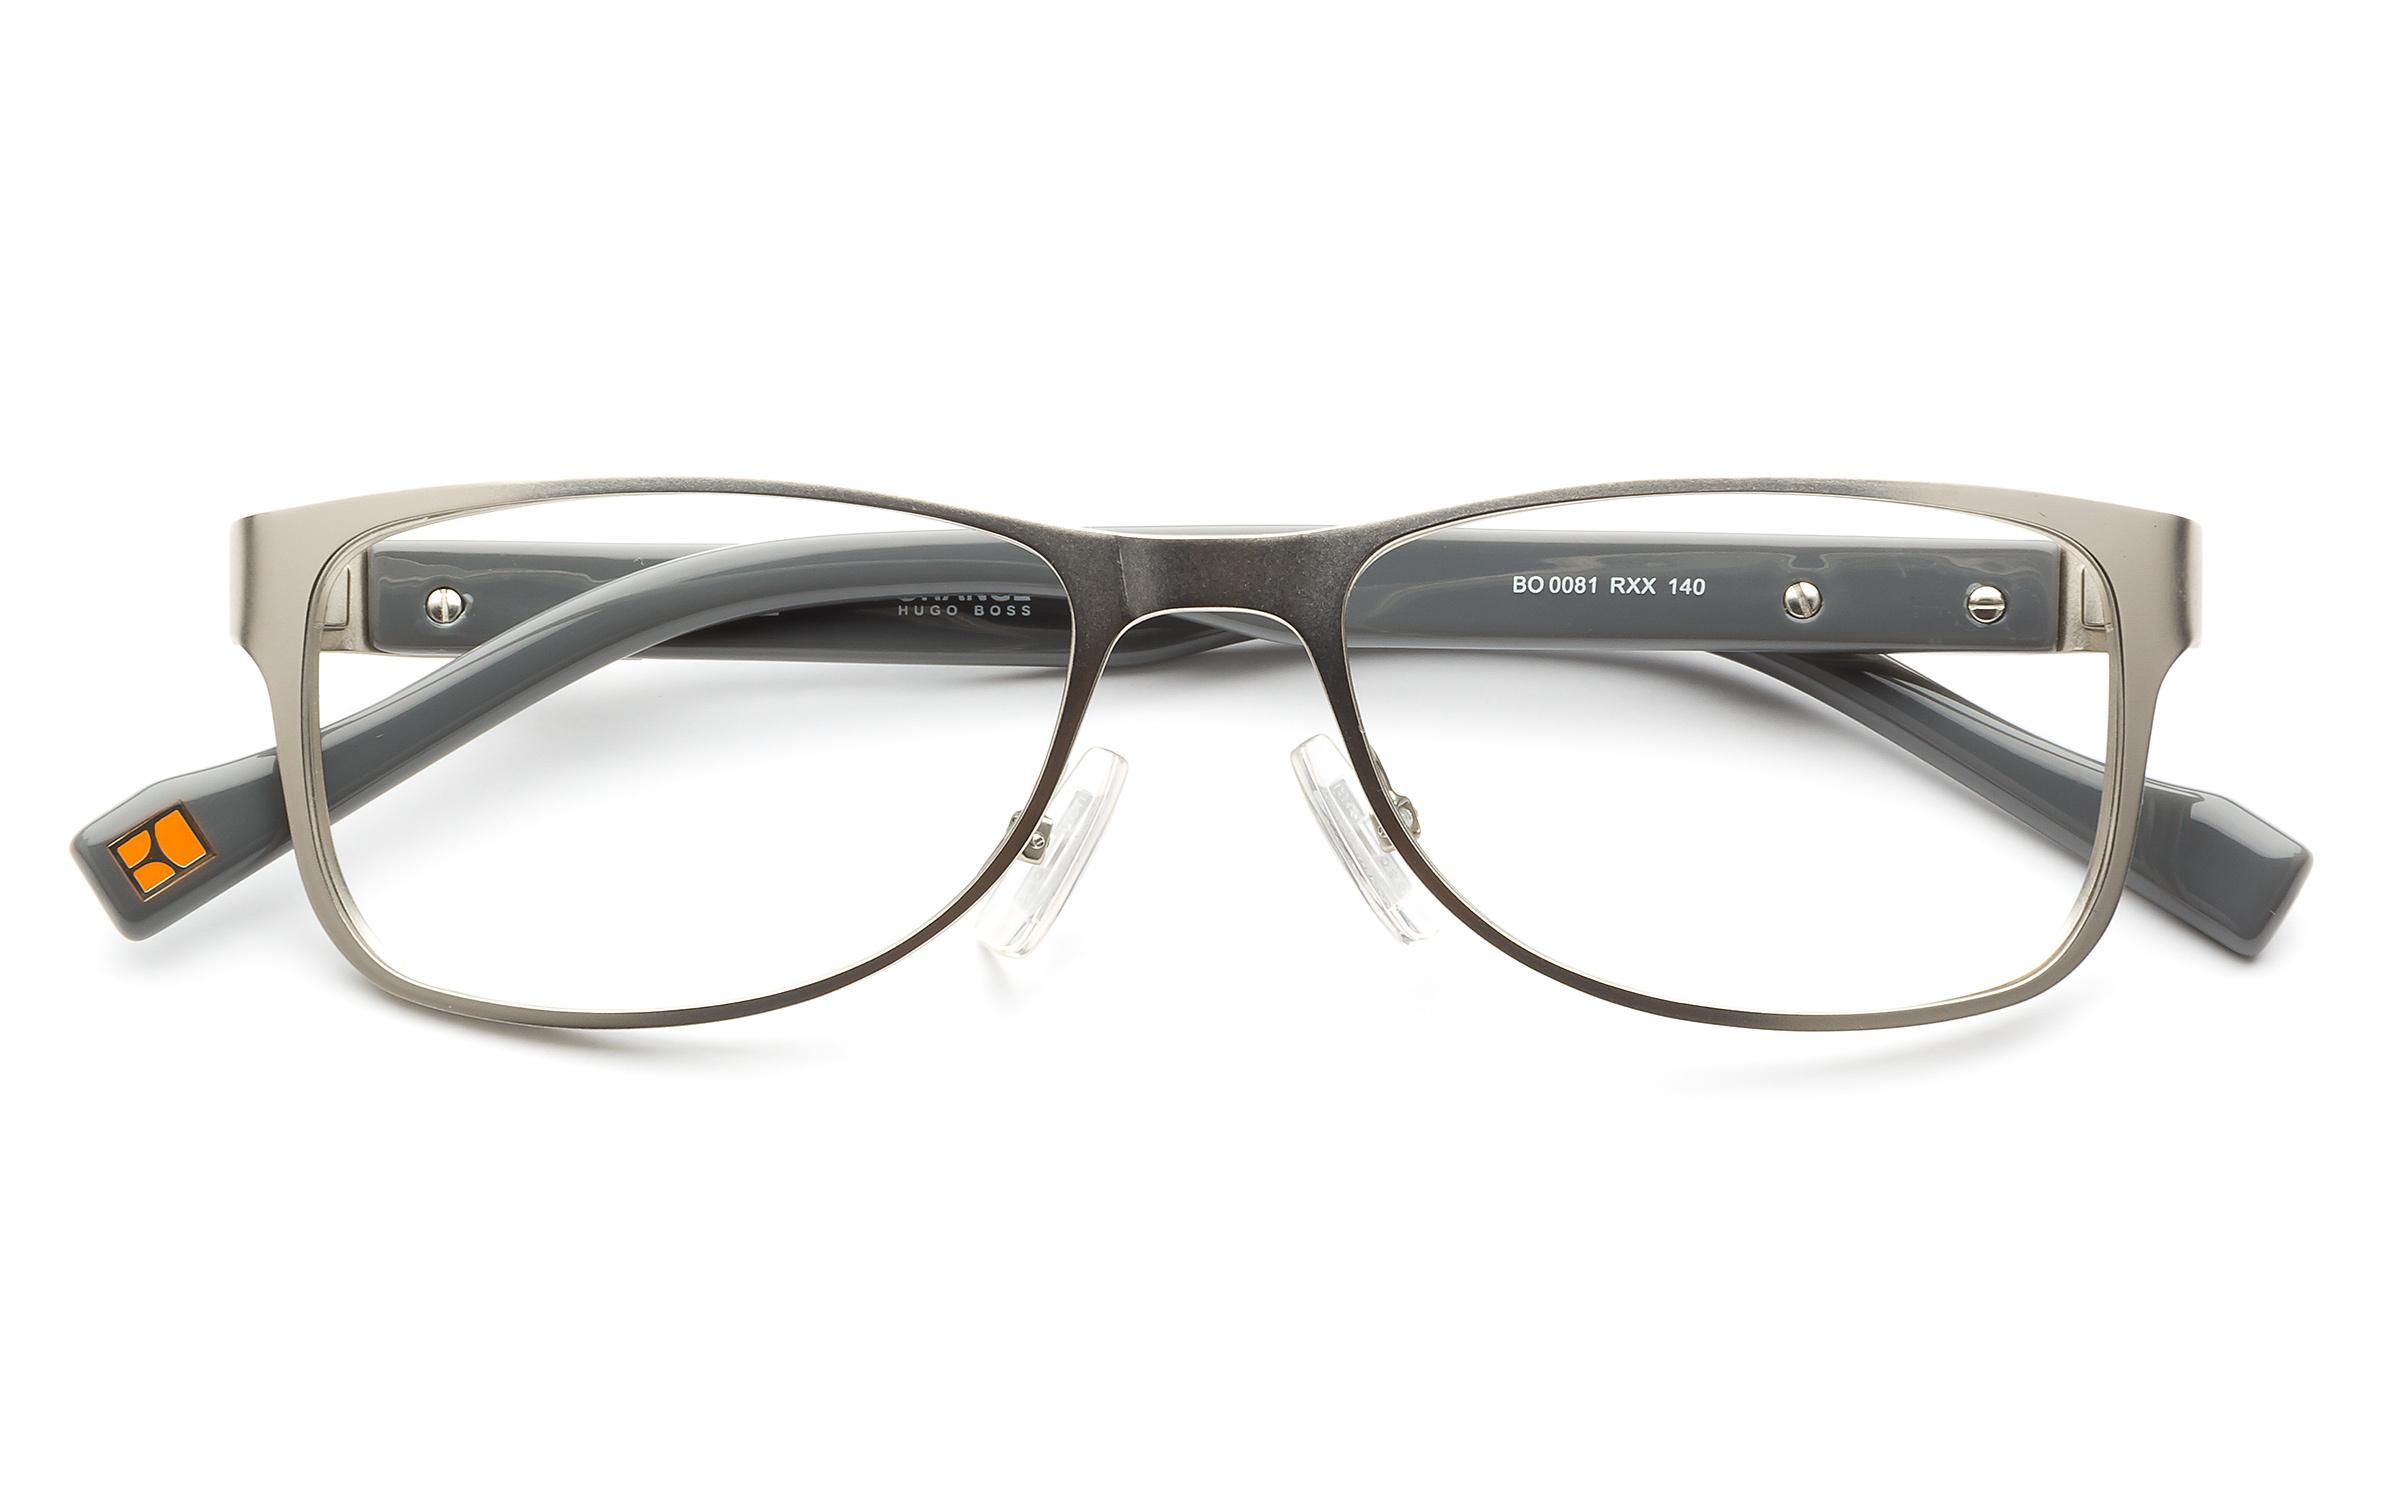 affordable glasses online 7qn1  product image of Boss Orange BO081-50 Palladium Gray